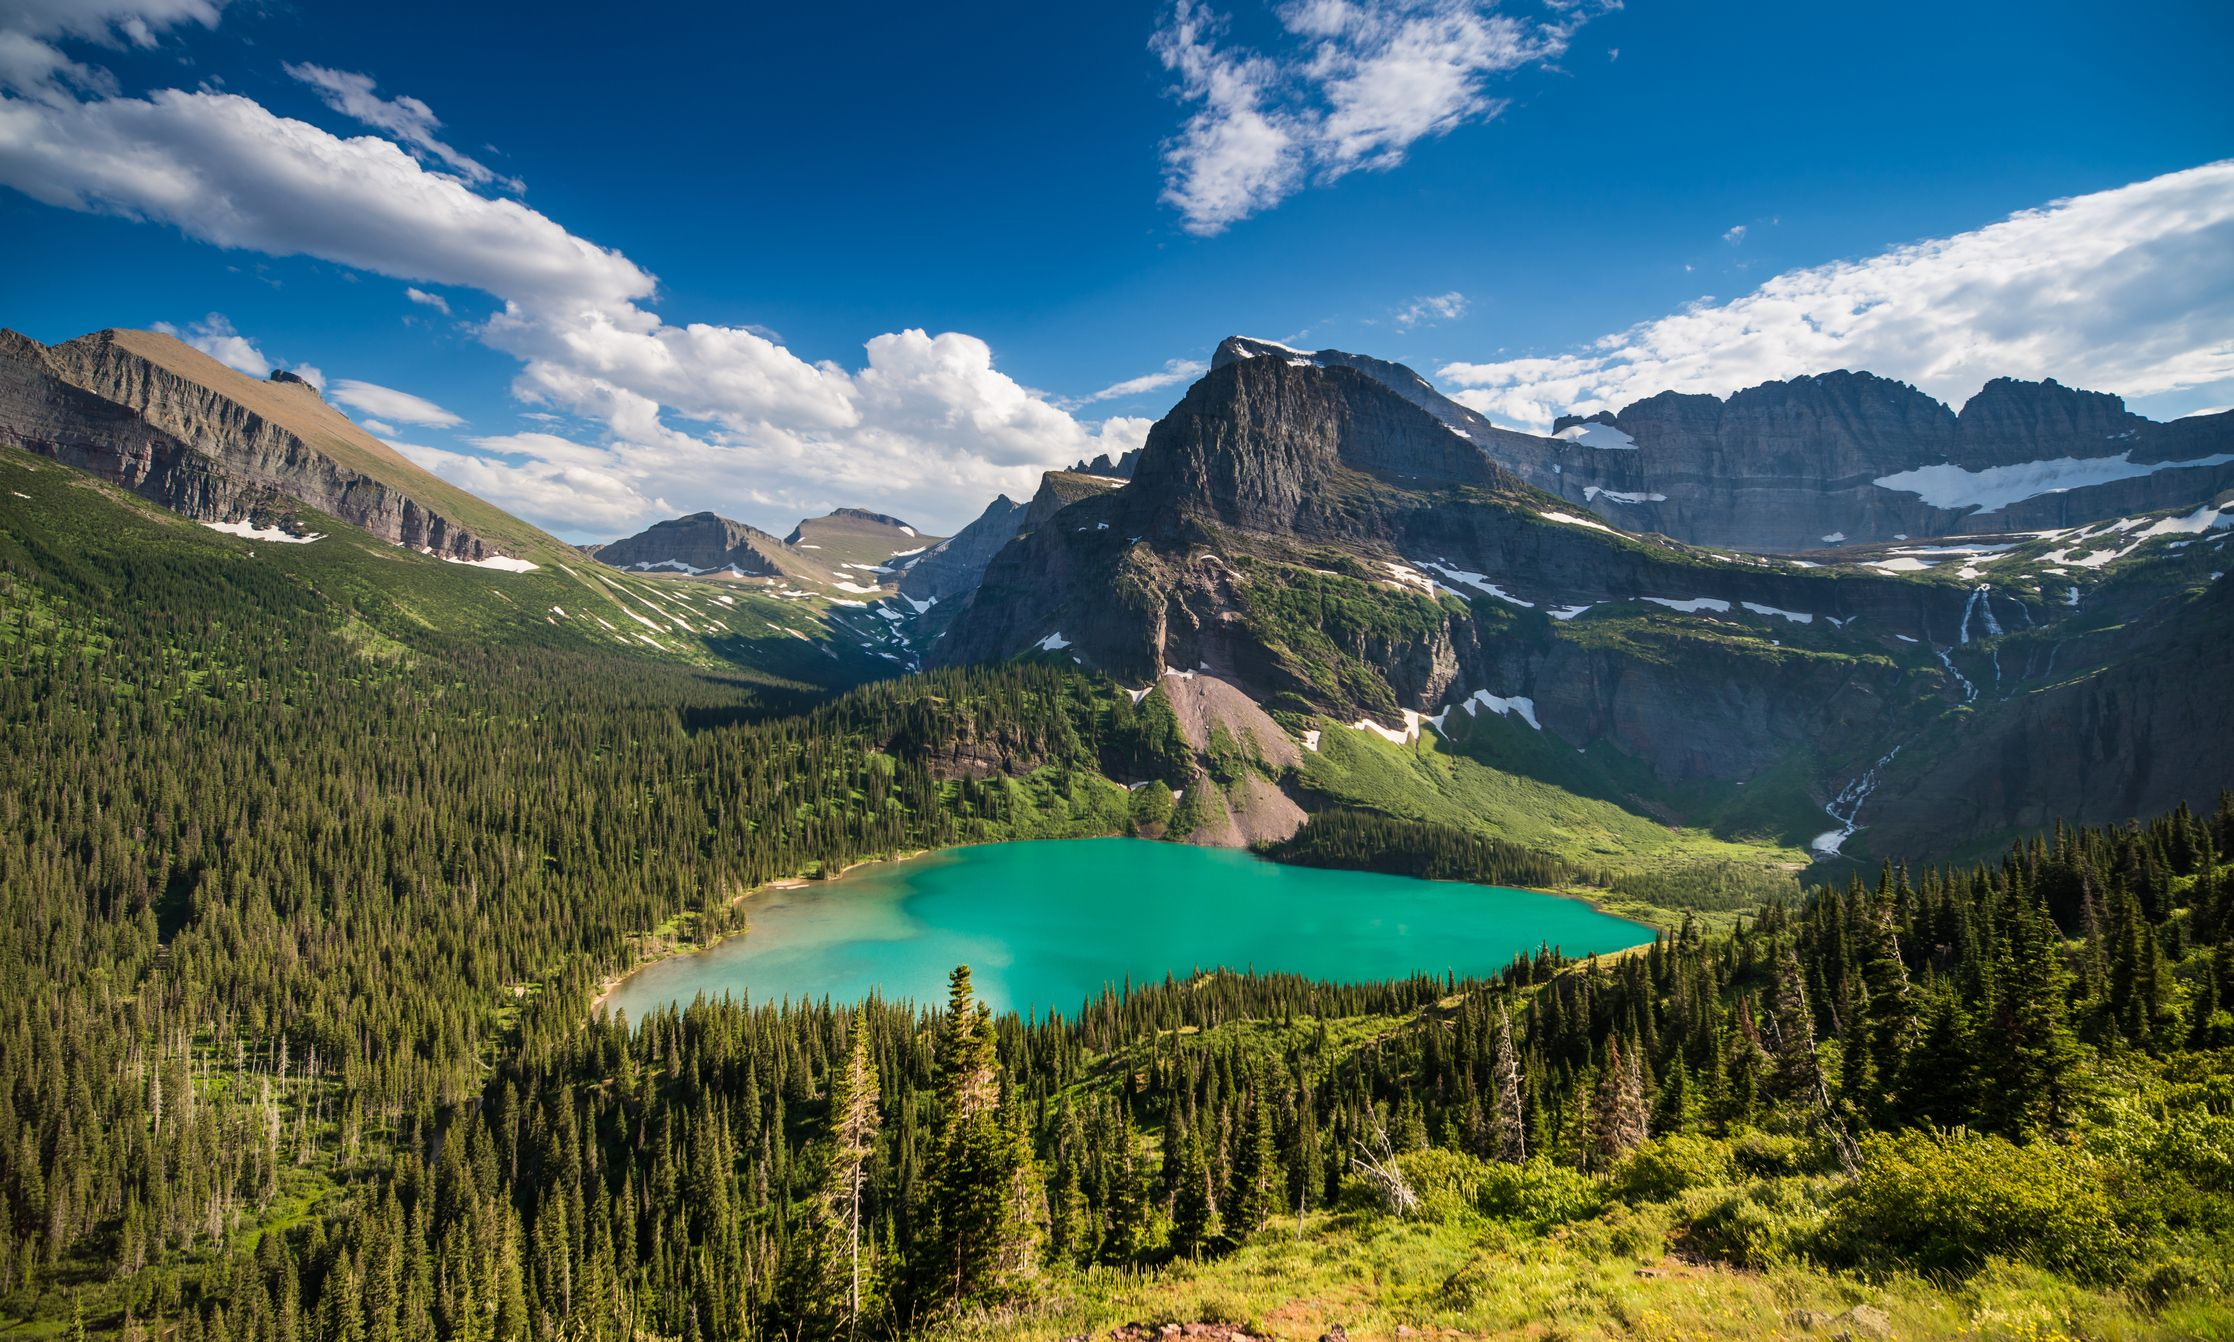 Grinnell Lake in Glacier National Park